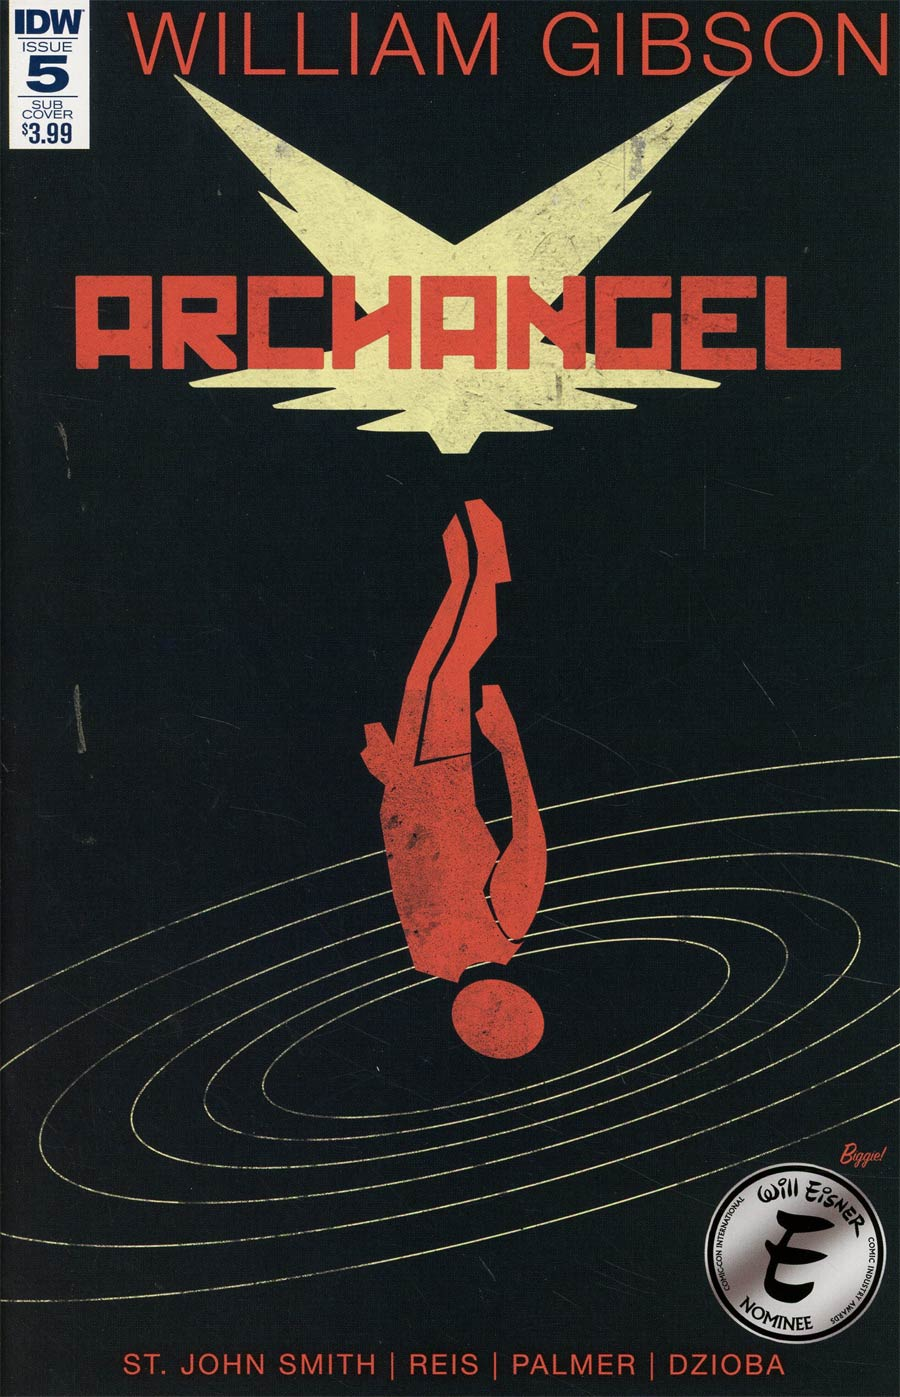 Archangel (IDW) #5 Cover C Variant James Biggie Subscription Cover